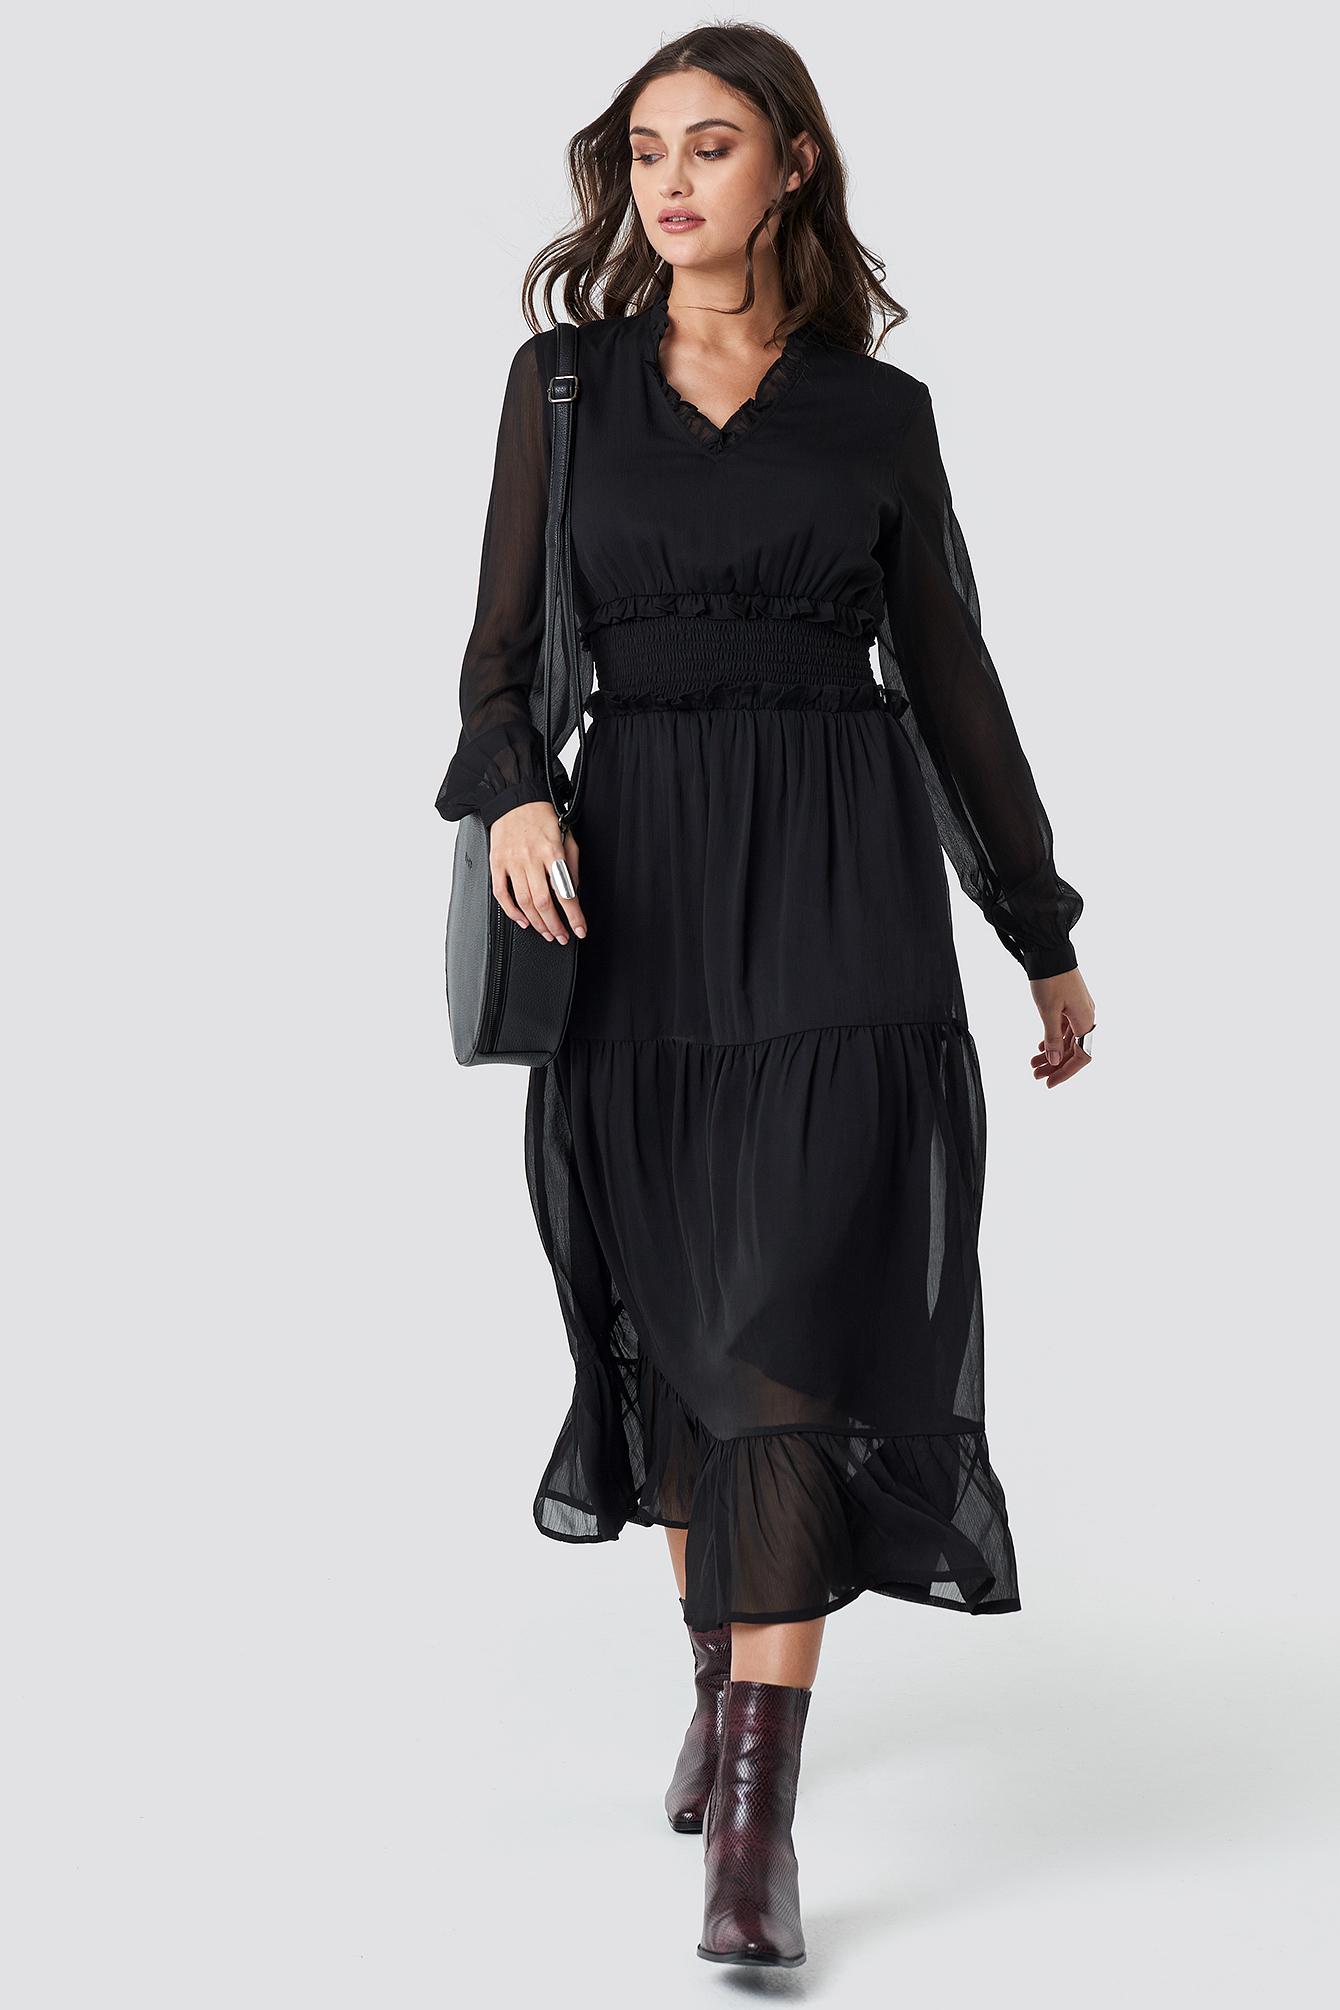 Ruffle Details Flowy Midi Dress NA-KD.COM